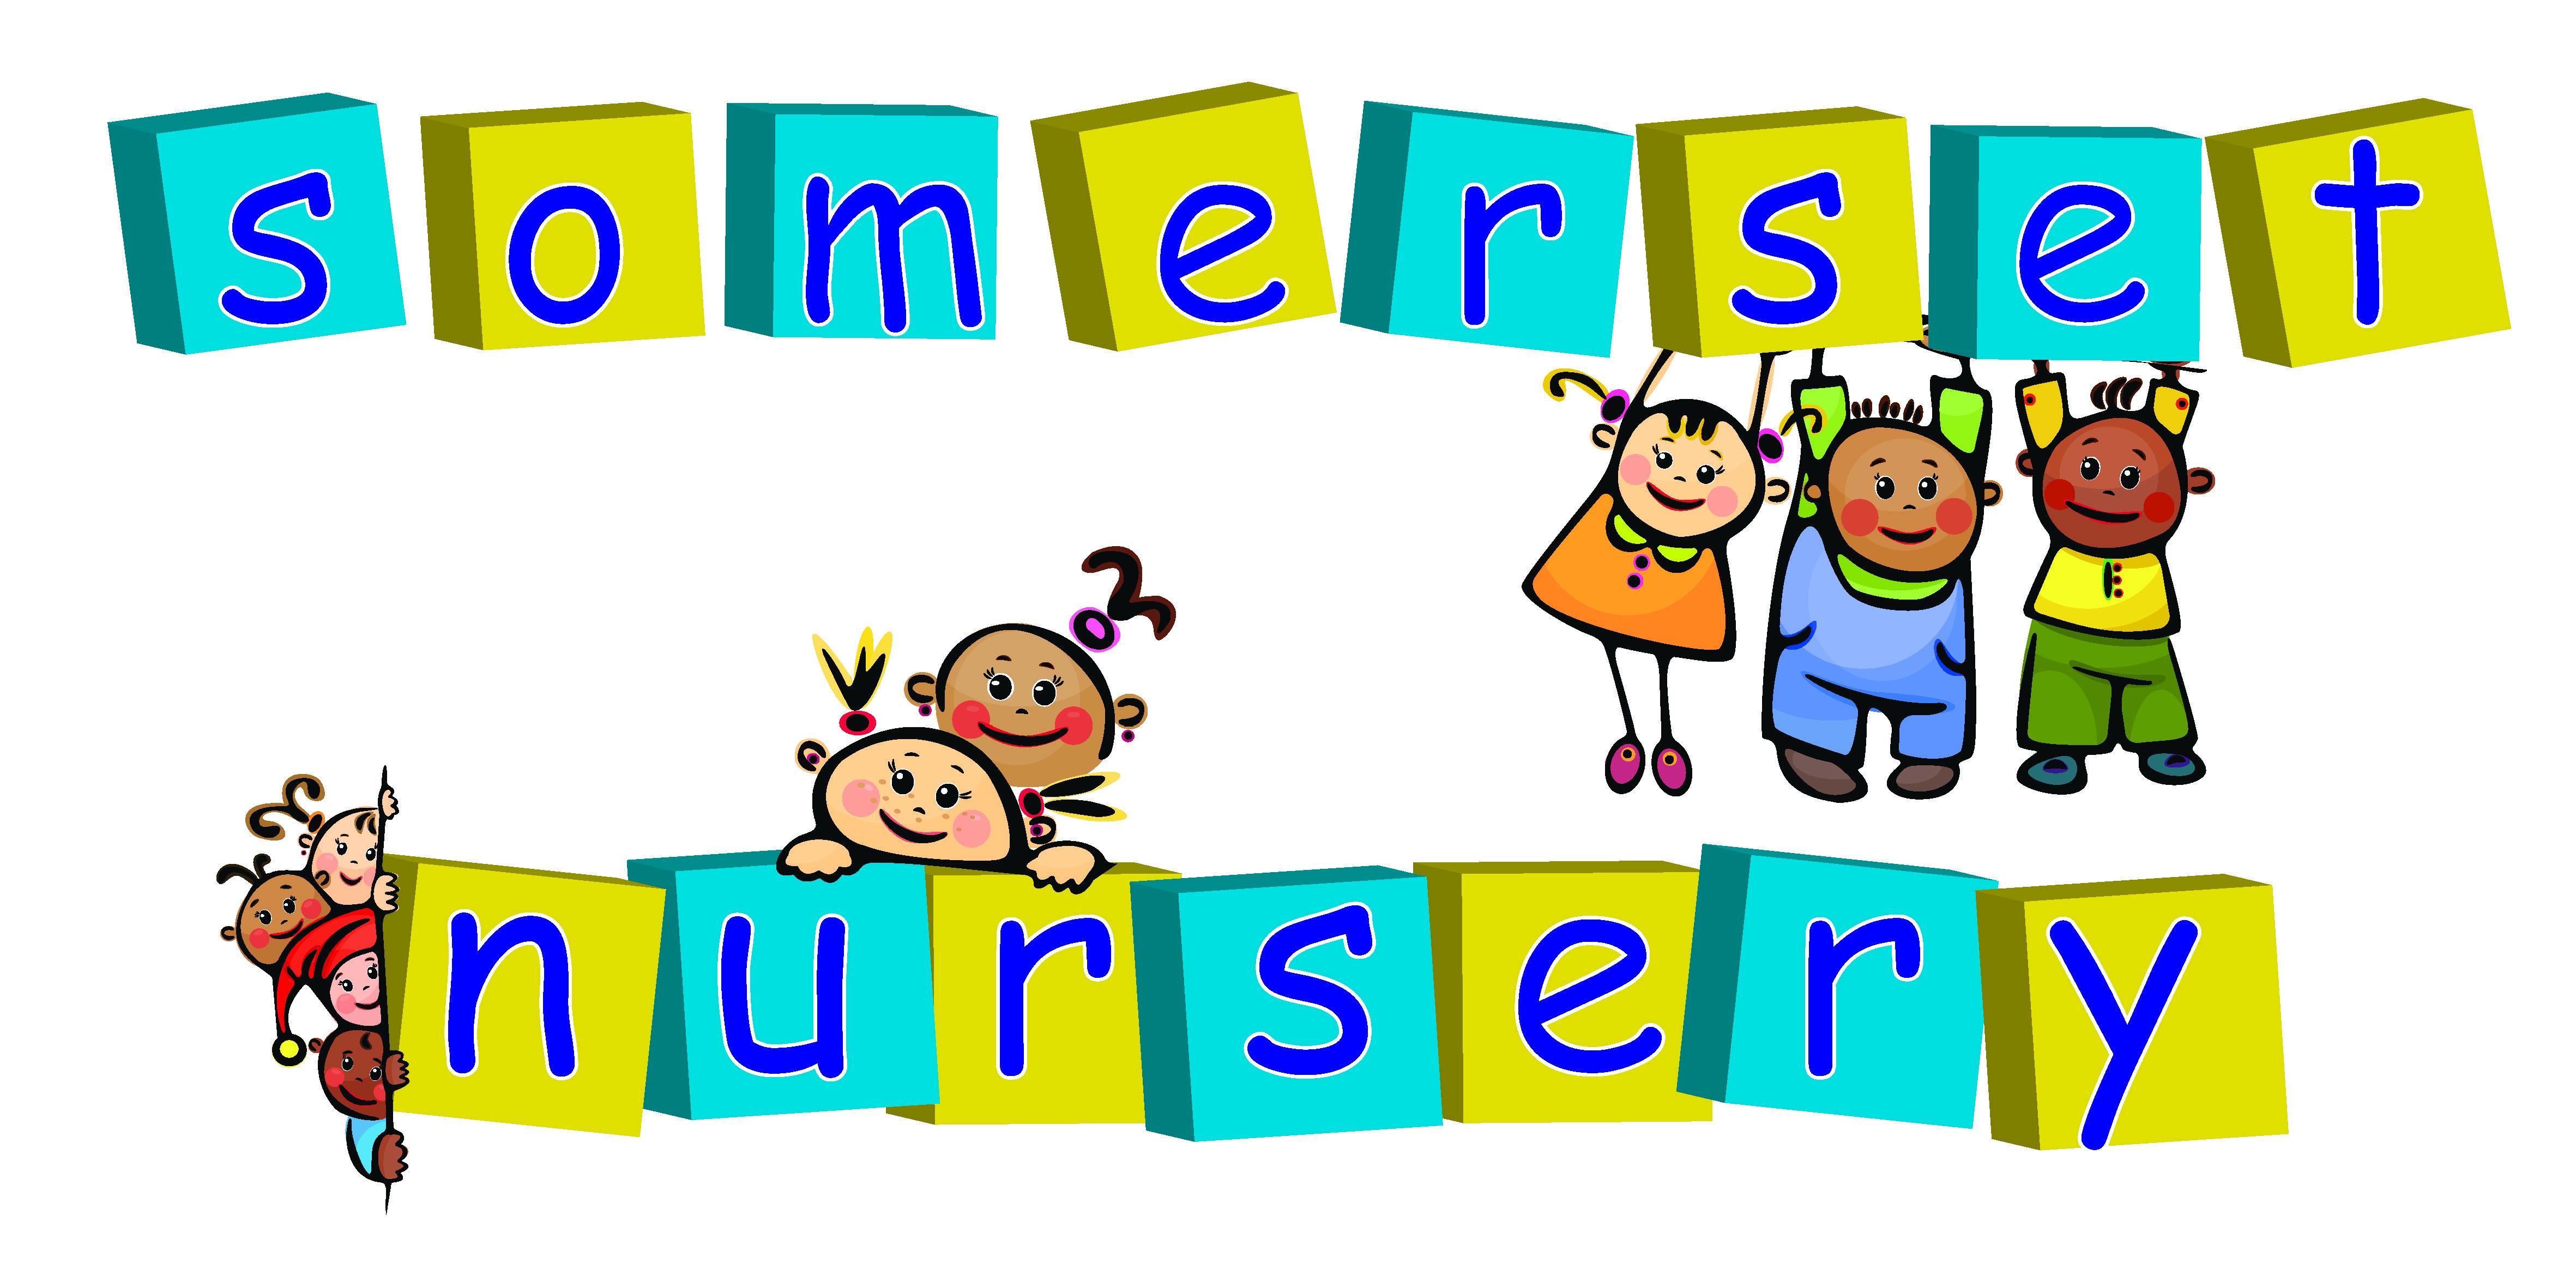 Somerset Nursery - Fitzroy